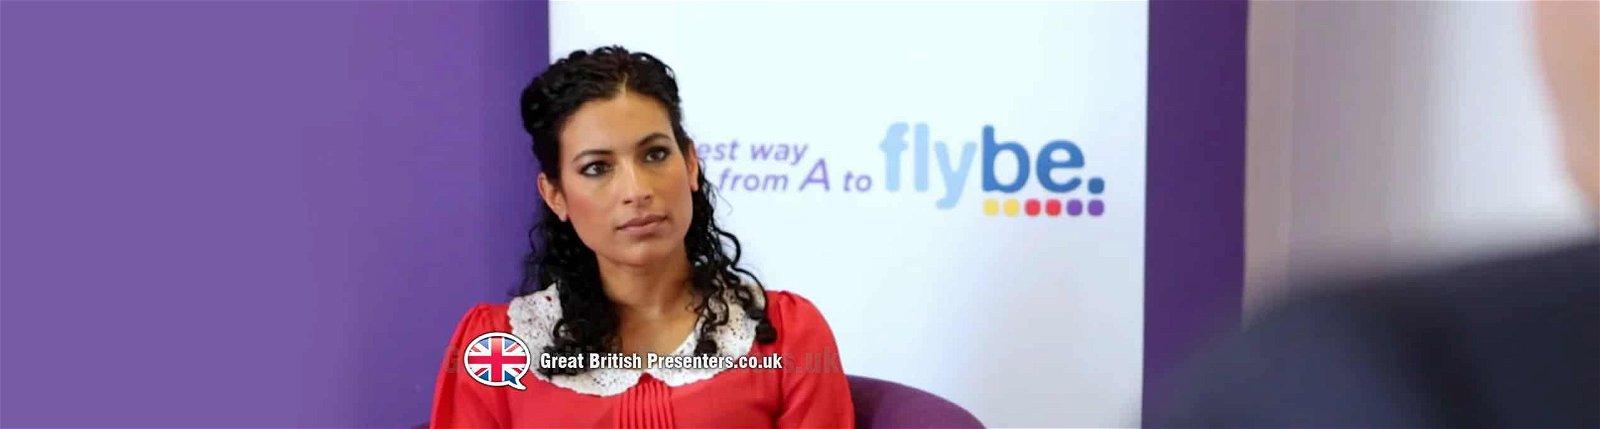 Hire Buisness broadcast journalist presenter host Nadira at Great British Presenters